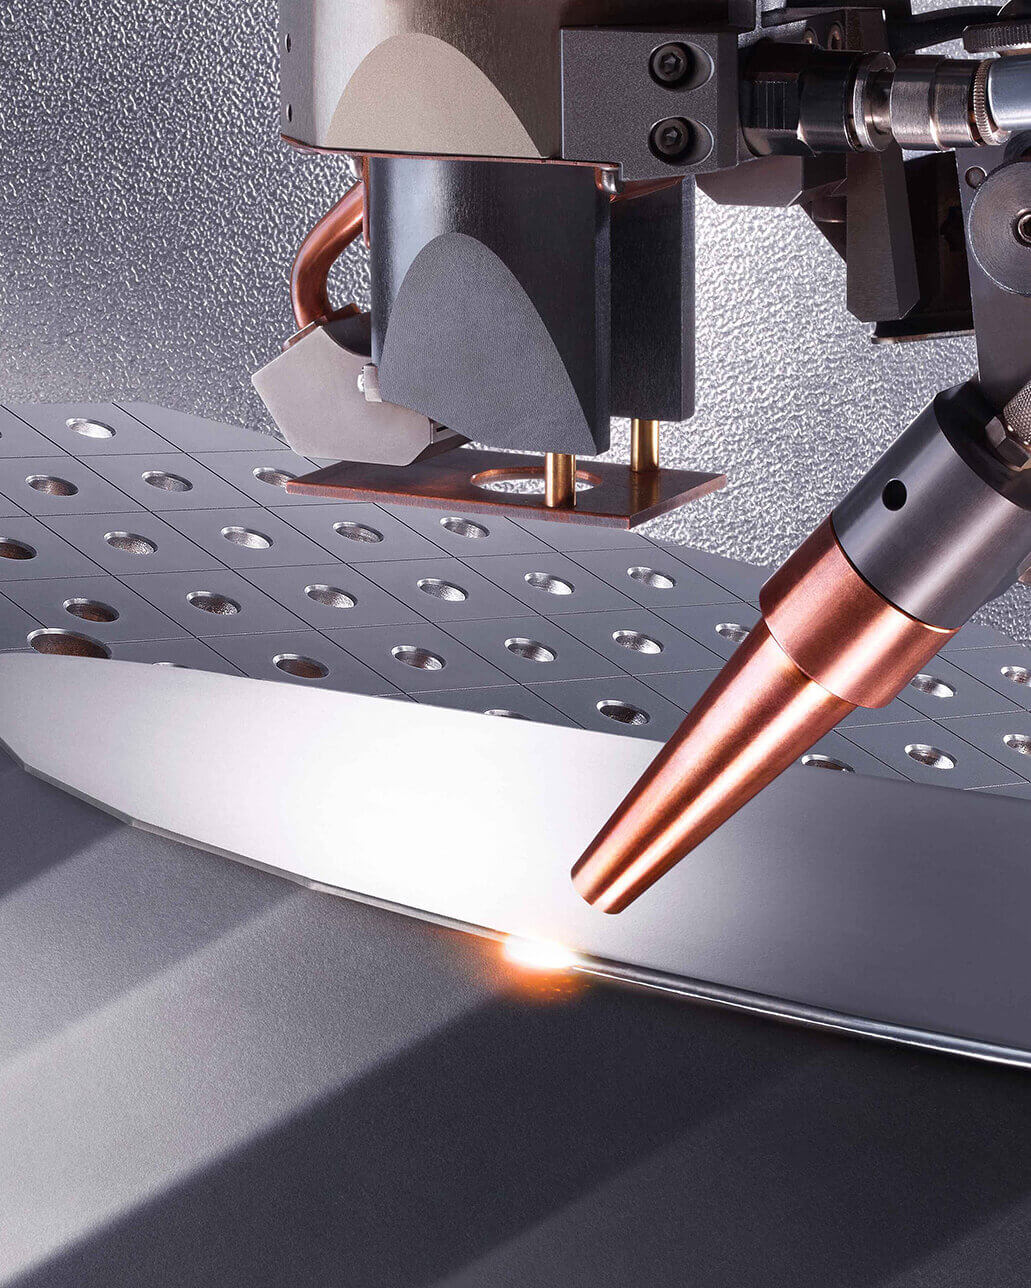 TRUMPF Laser welding systems